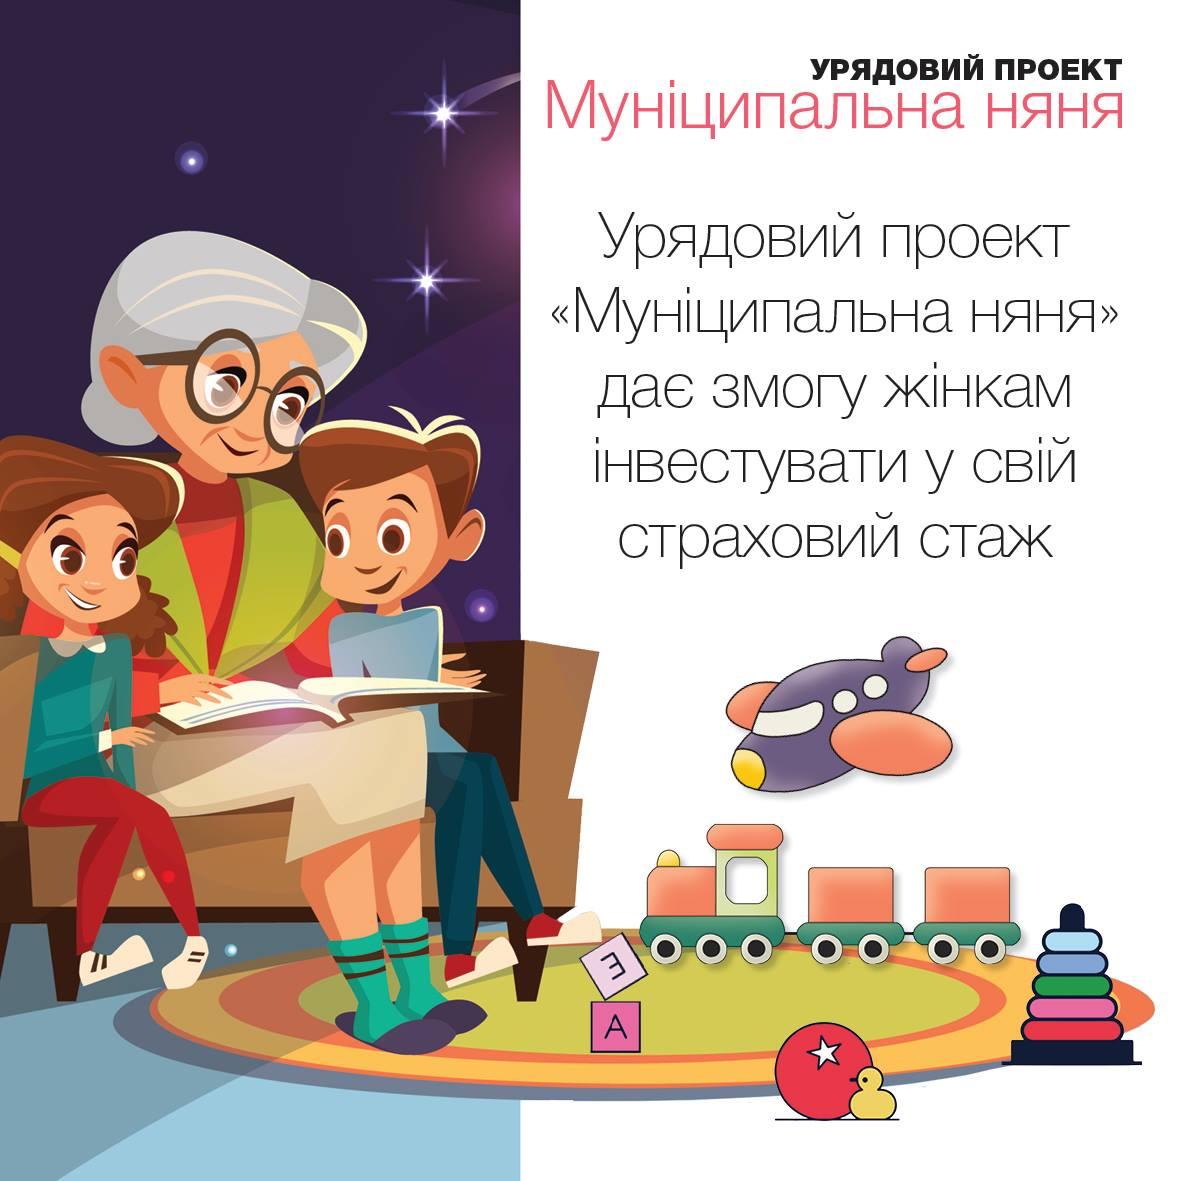 https://www.msp.gov.ua/files/pictures/2019/%D0%BD%D1%8F%D0%BD%D1%8F2.jpg